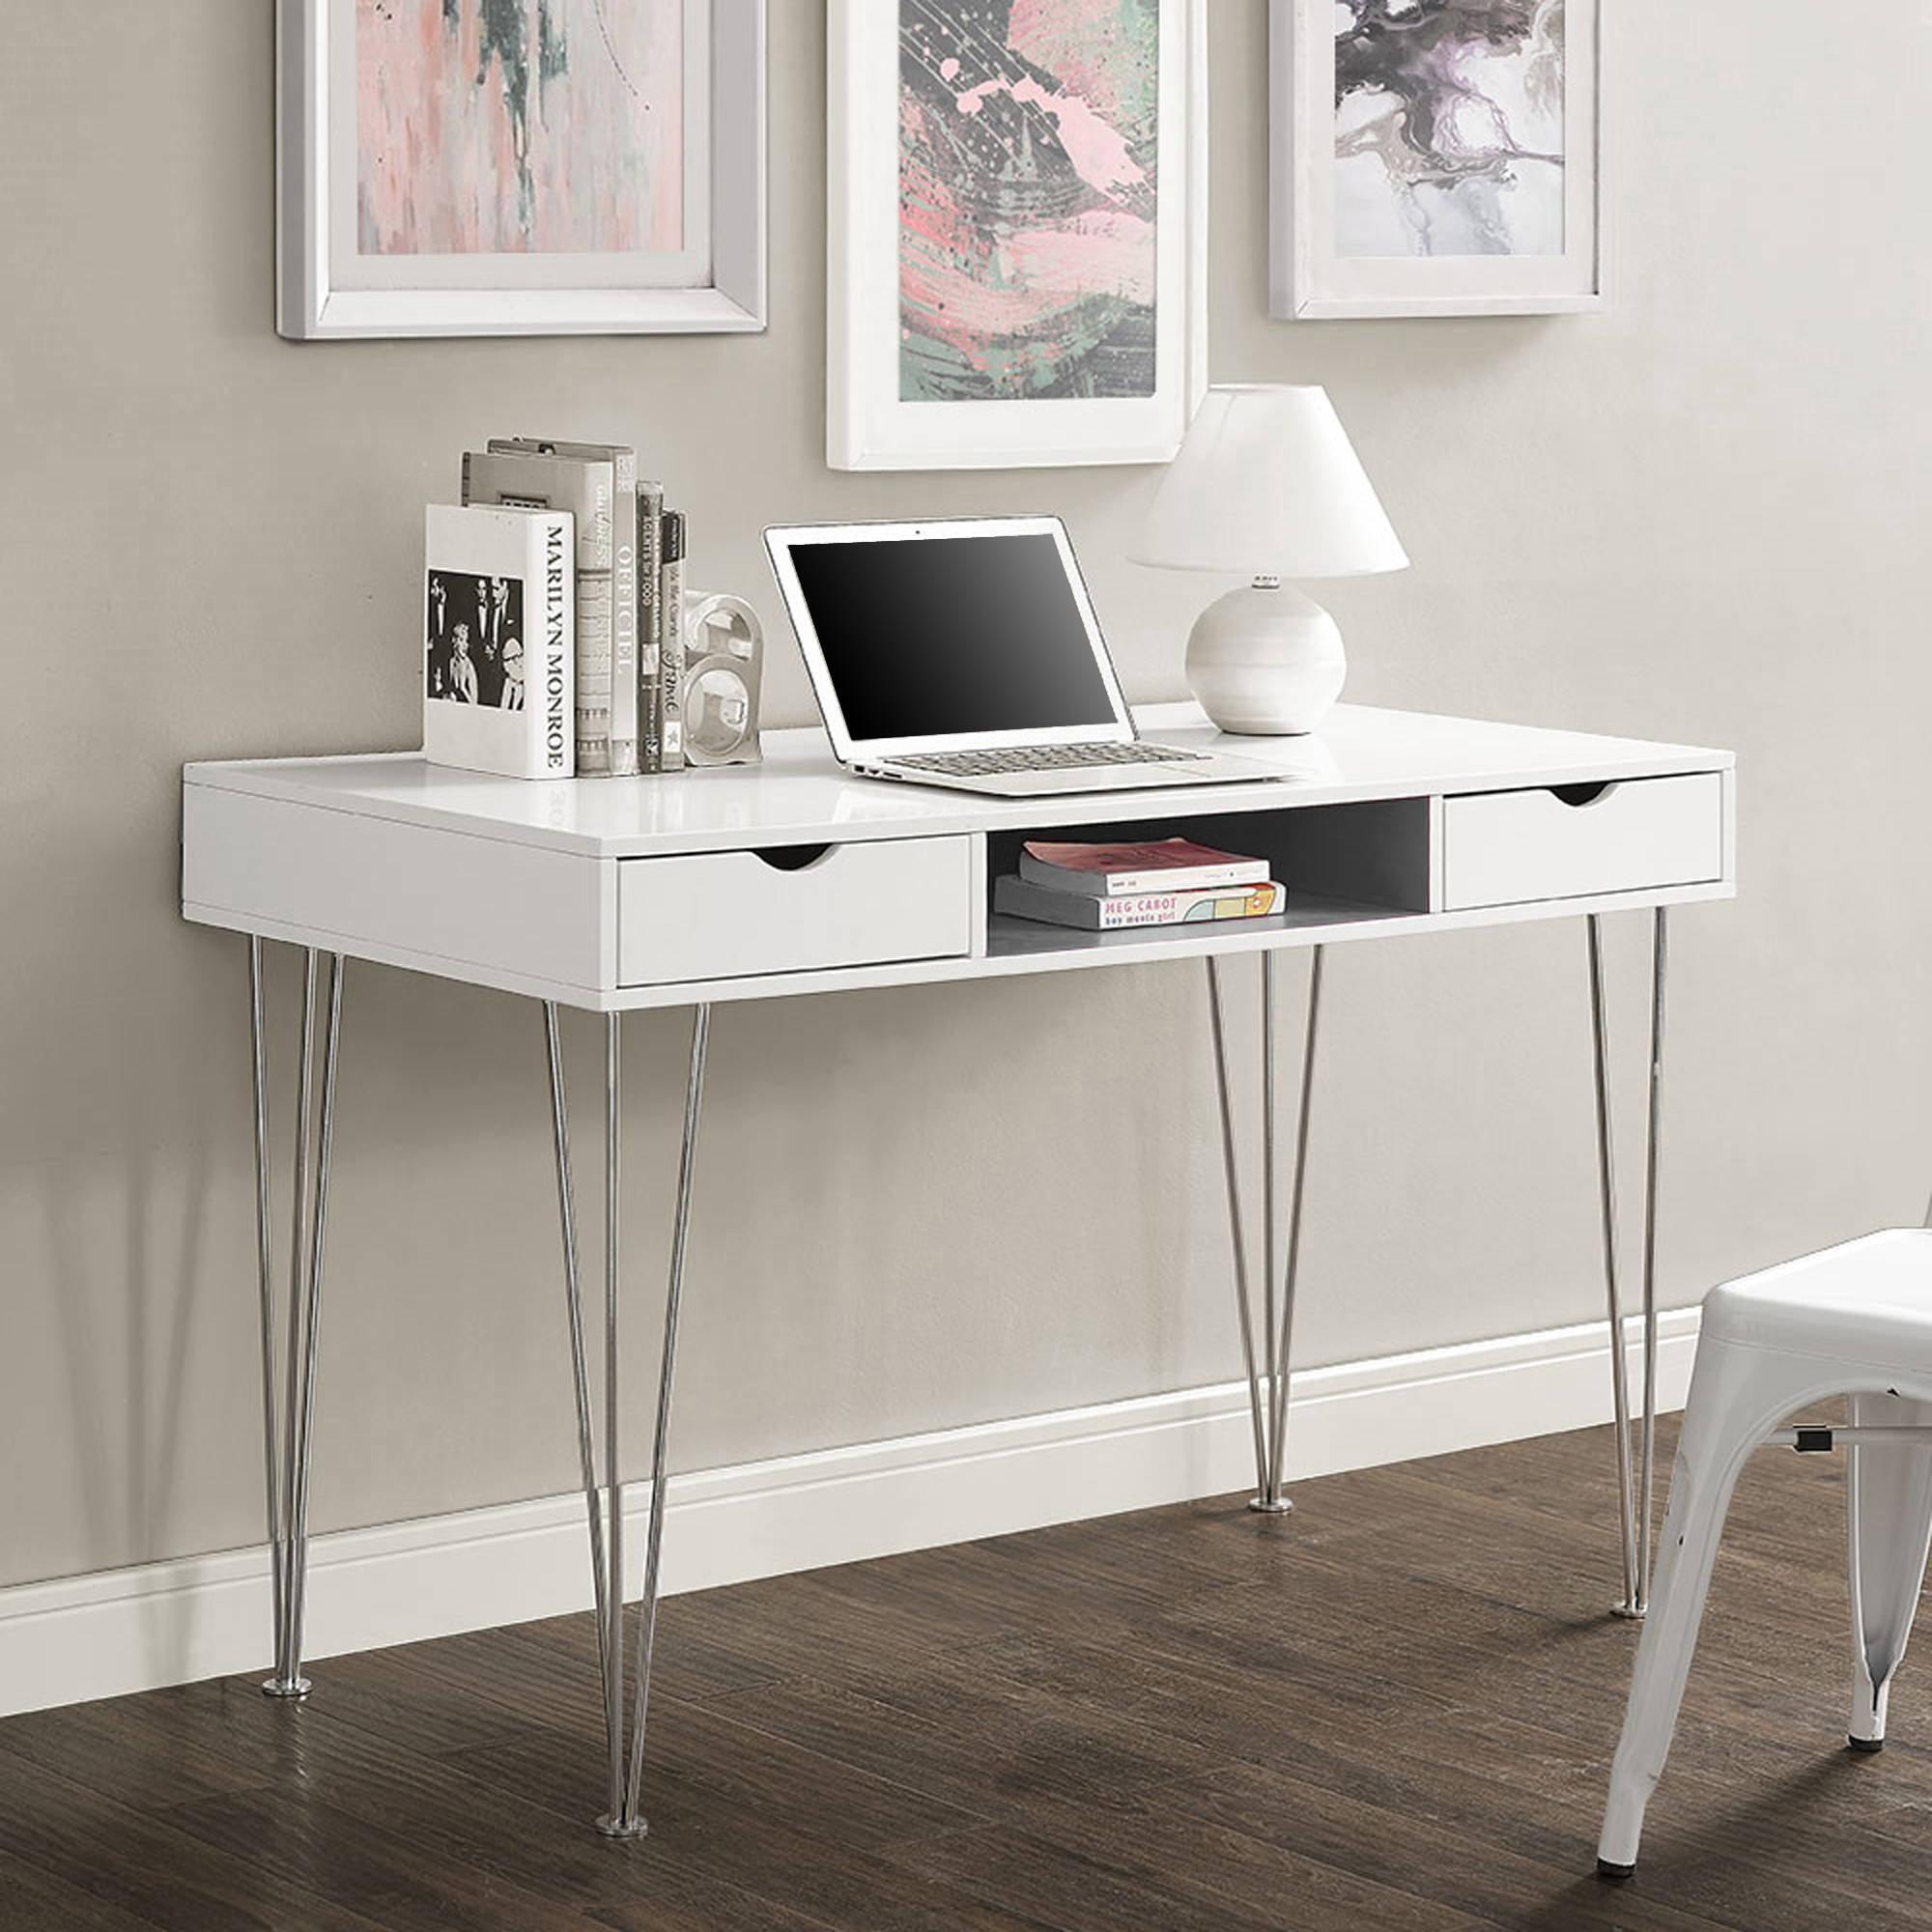 "Walker Edison 48"" Modern Wood Computer Desk, Multiple Colors"